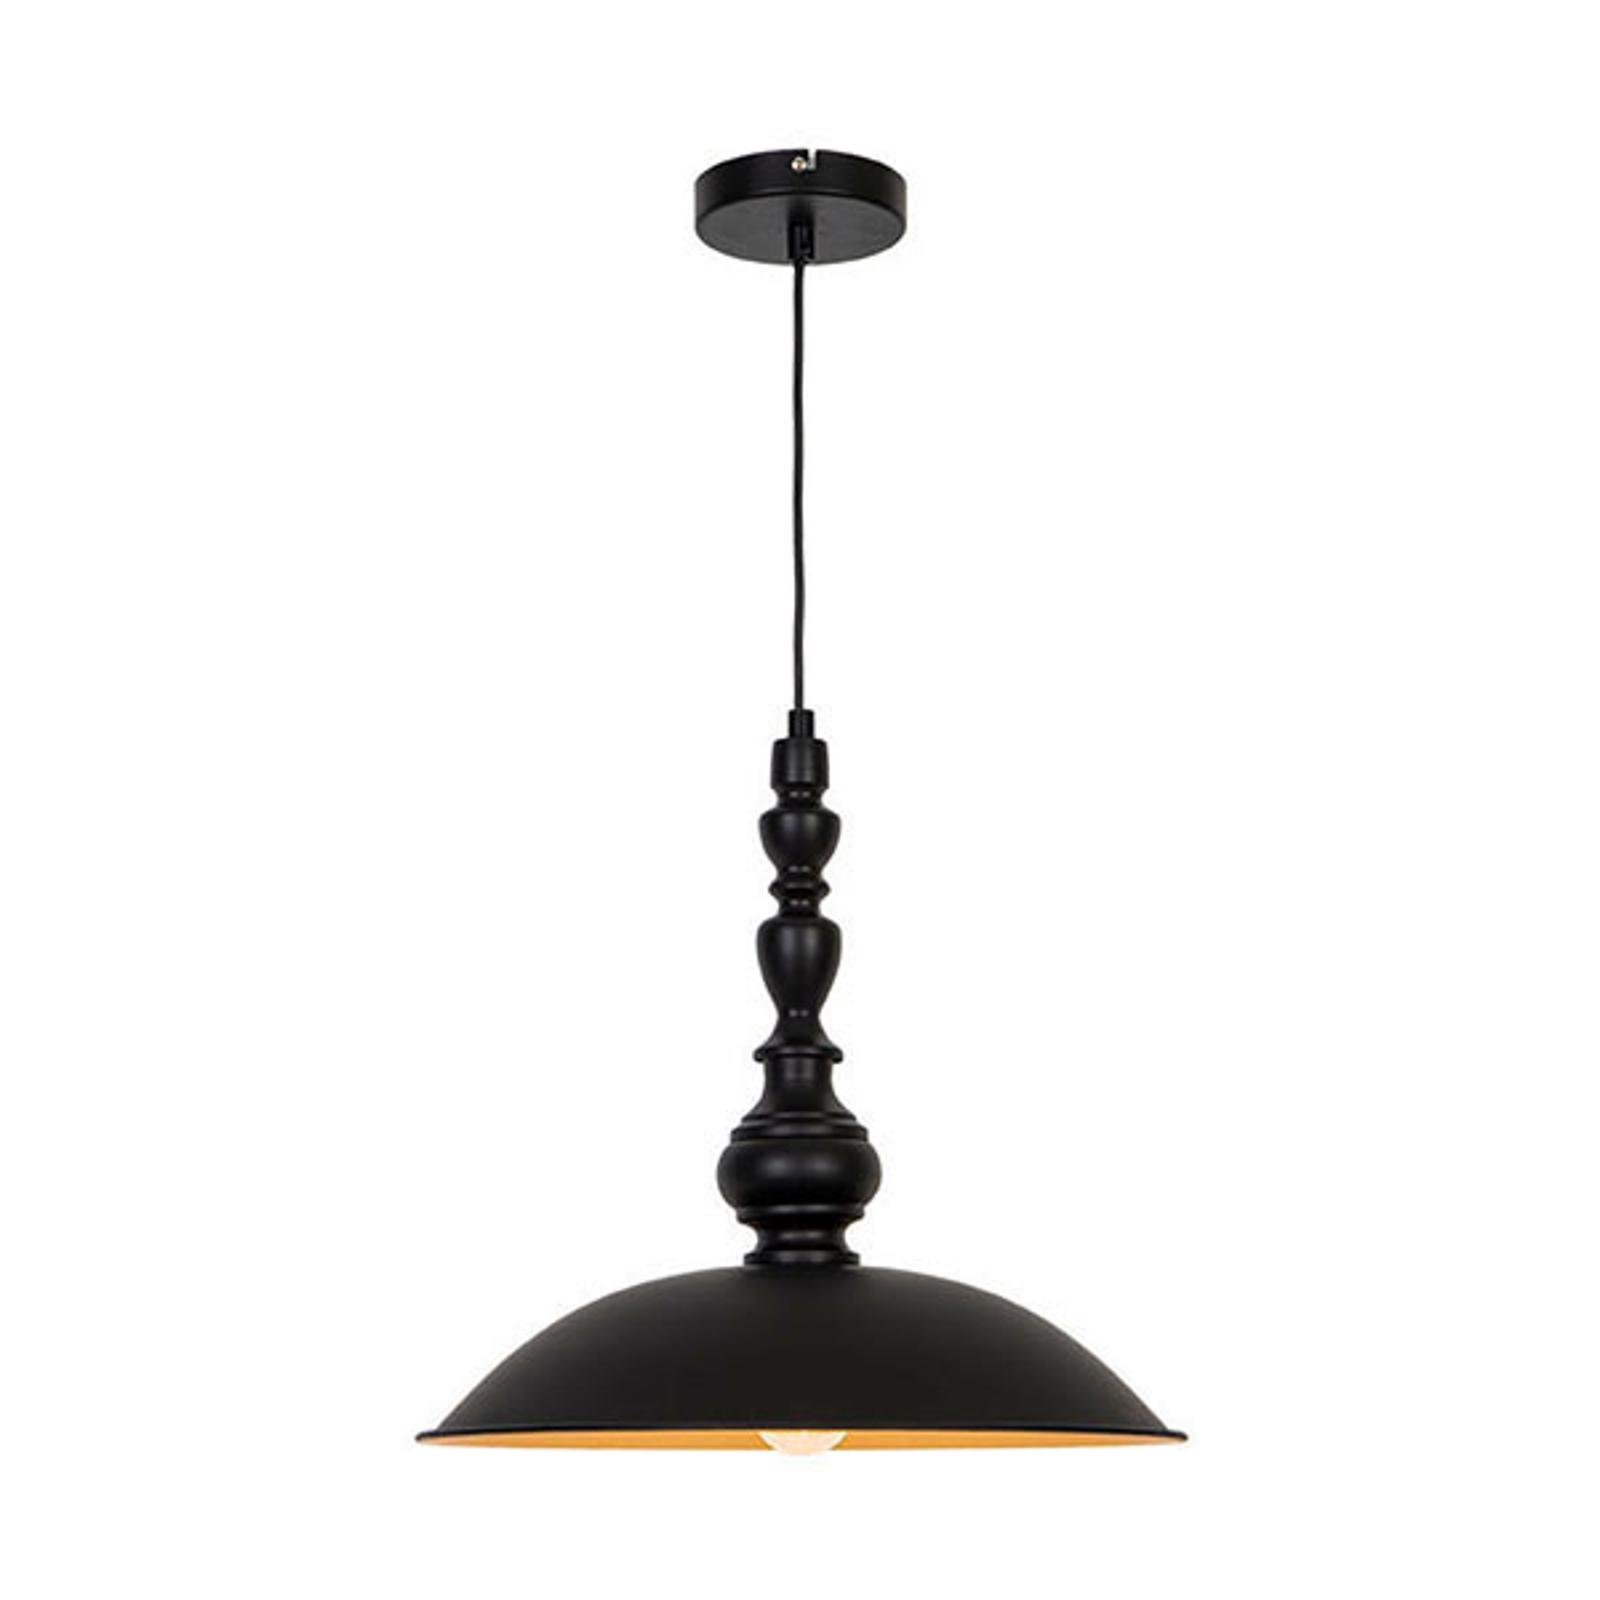 Lampa wisząca Colin, czarna, Ø 40 cm